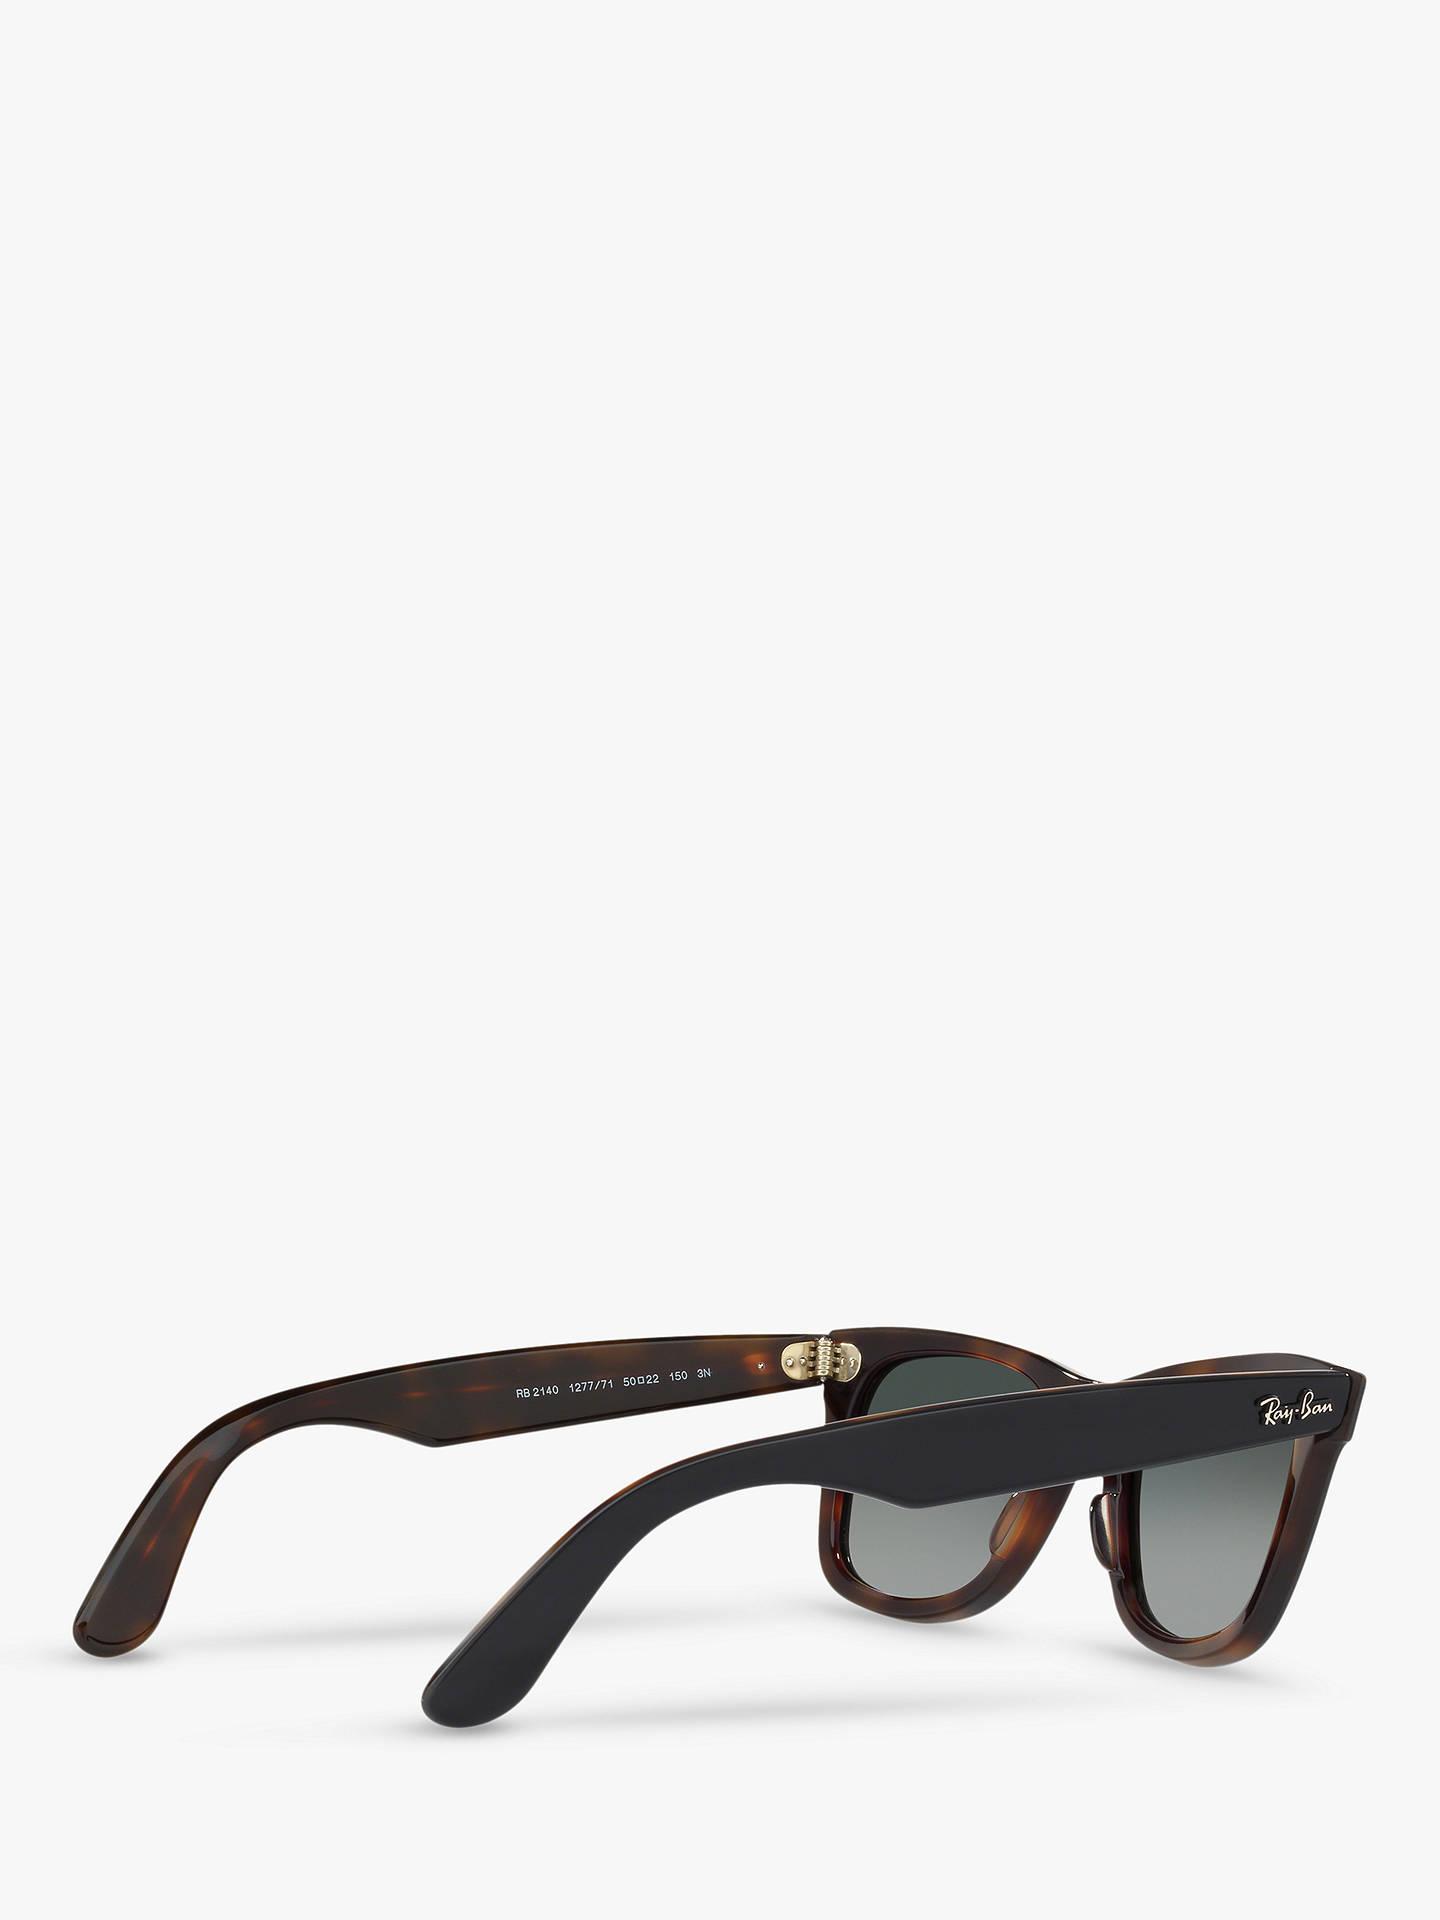 176dfef39 ... Buy Ray-Ban RB2140 Women's Original Wayfarer Sunglasses, Grey/Grey  Gradient Online at ...